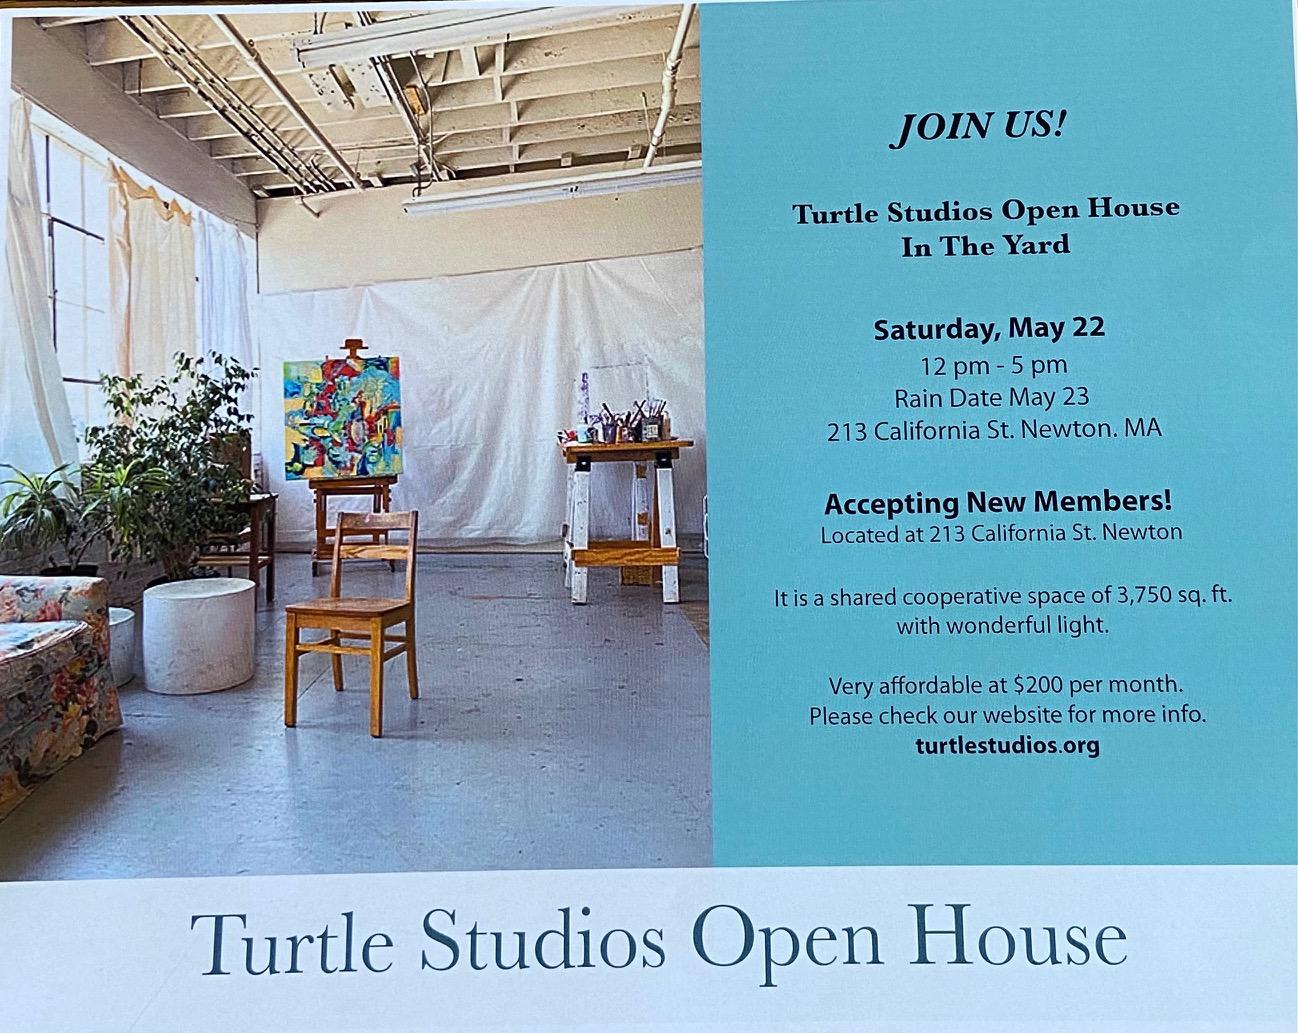 Turtle Studios Open House in the Yard